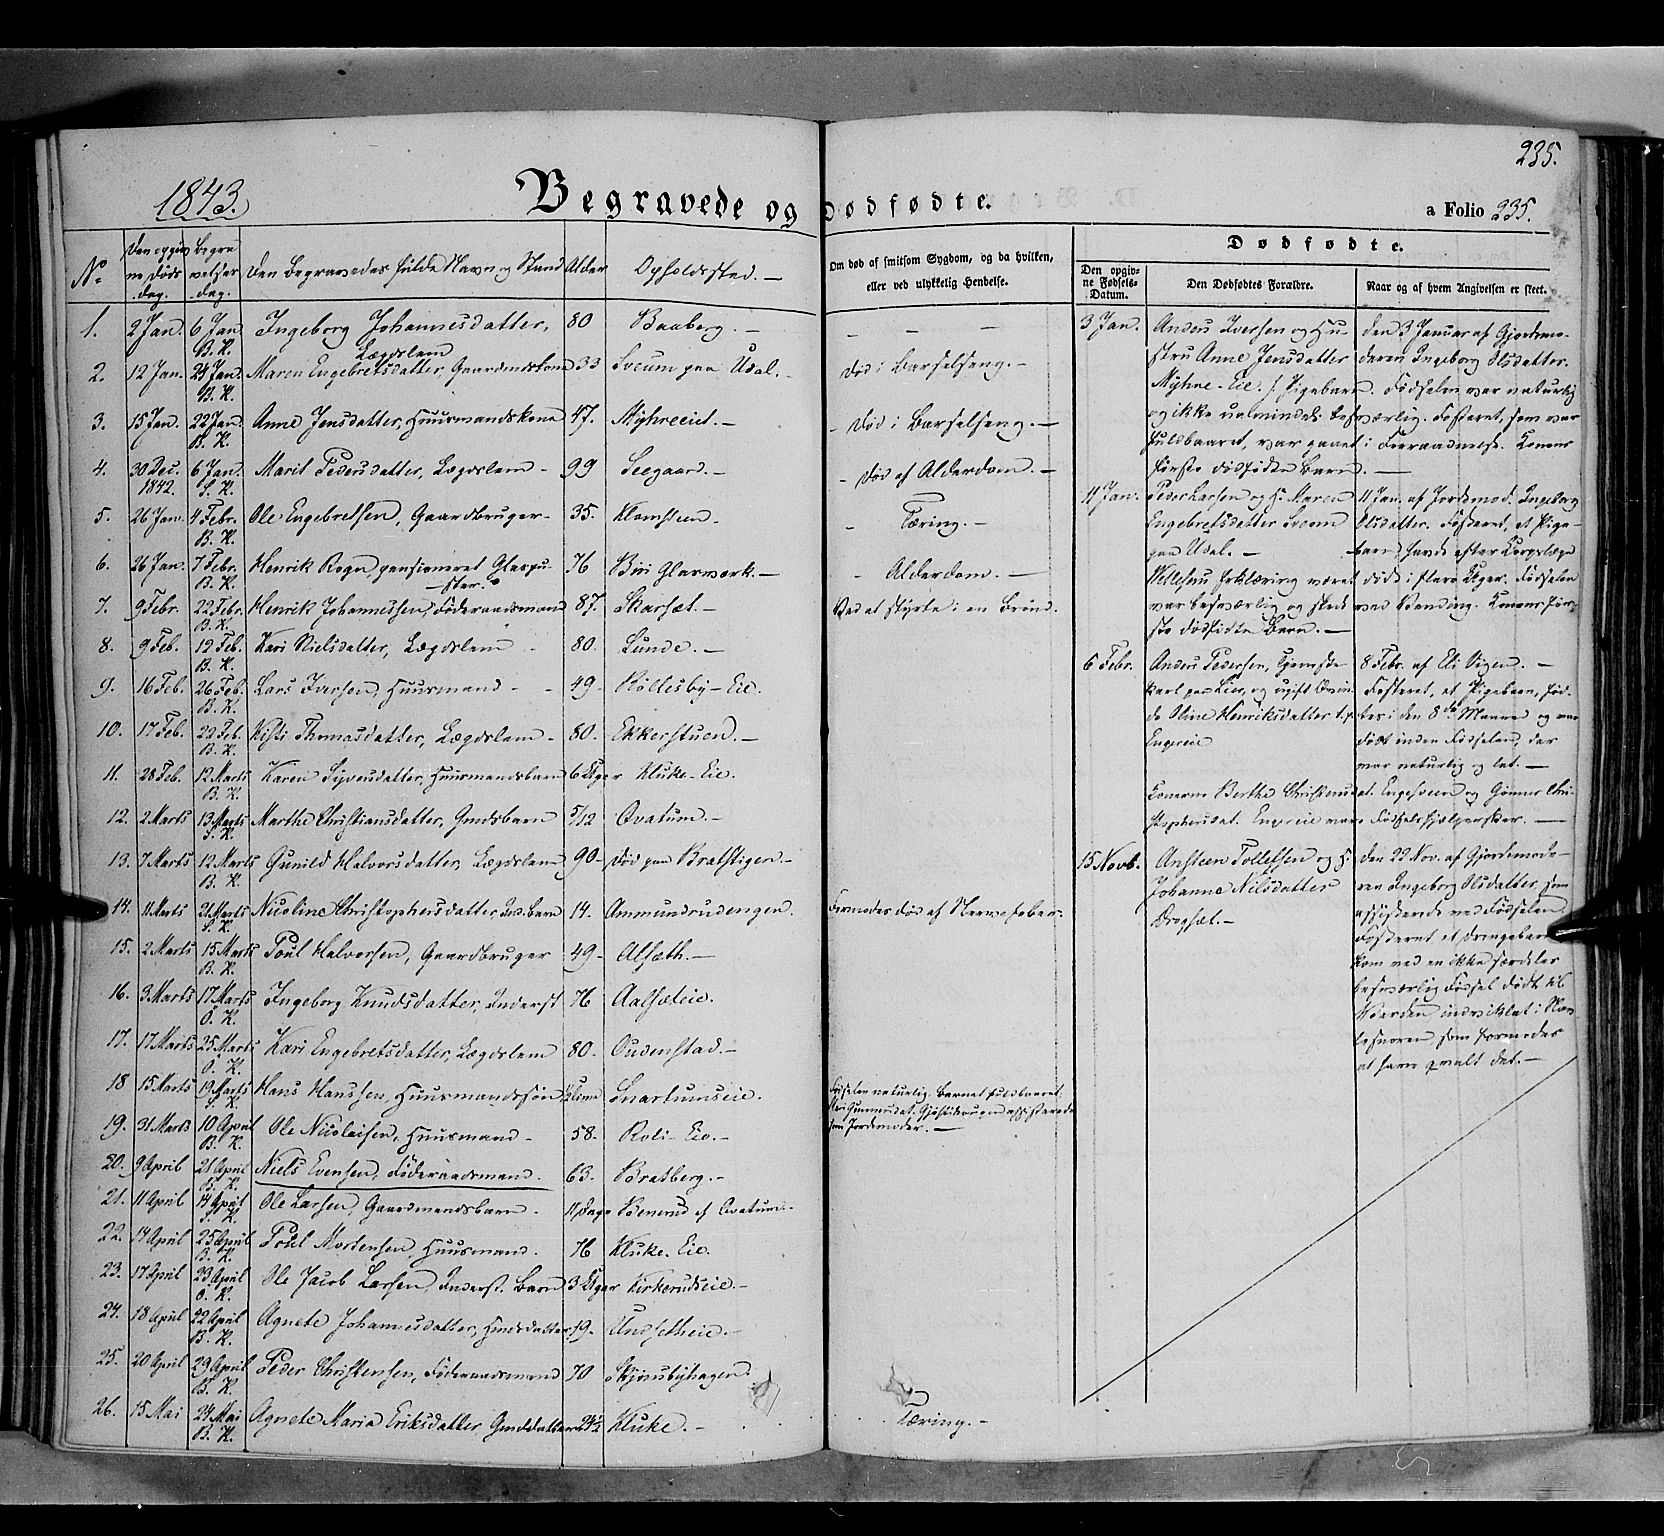 SAH, Biri prestekontor, Ministerialbok nr. 5, 1843-1854, s. 235